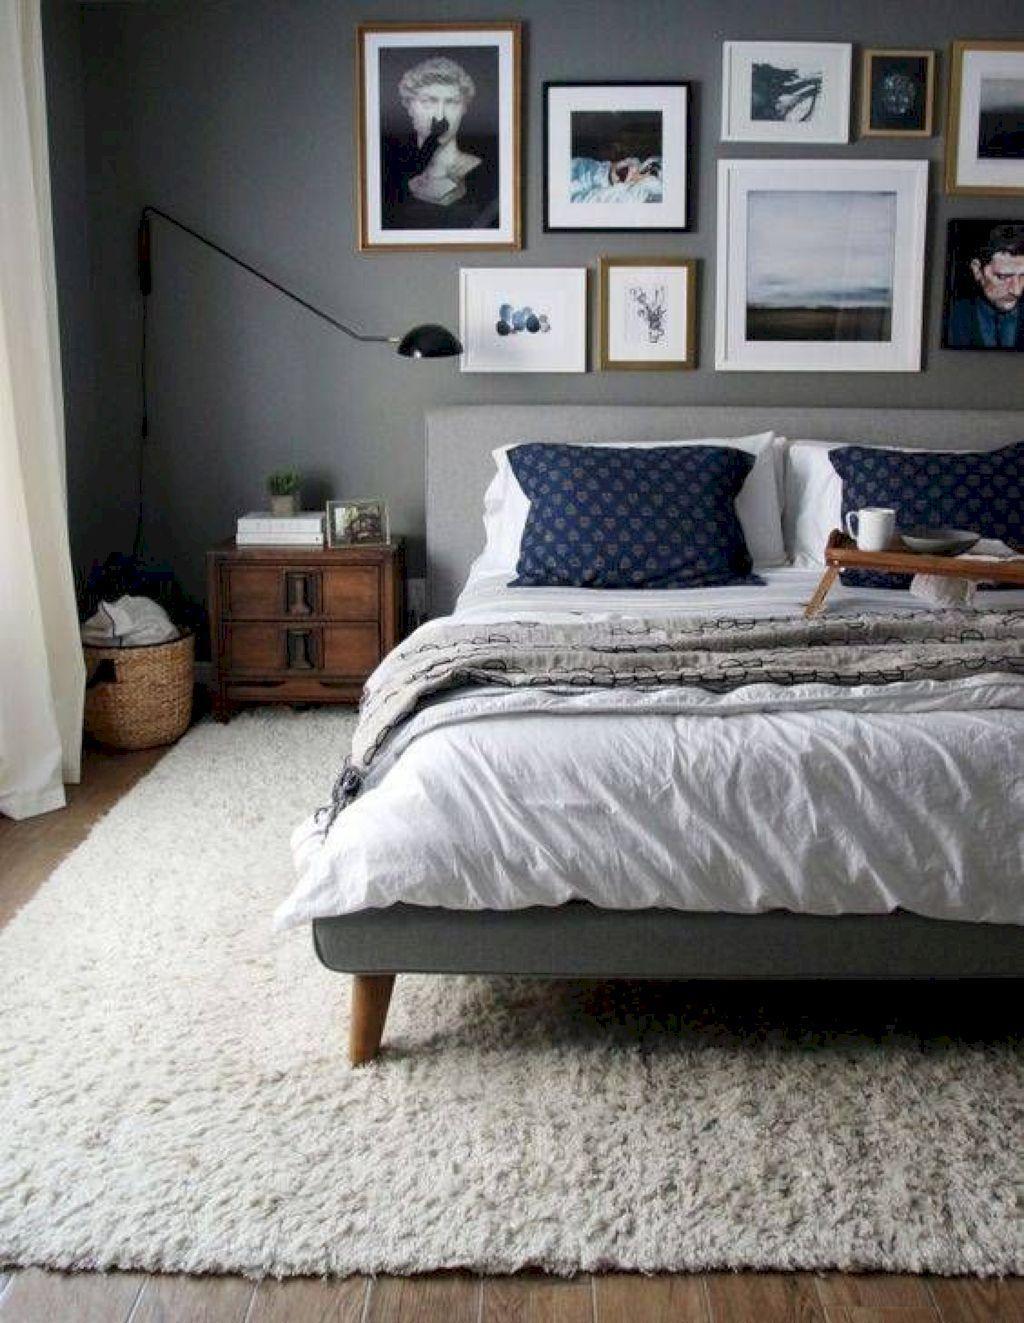 21 Beautiful Comfy Bedroom Decorating Ideas Bedroom Interior Bedroom Decor Cozy Home Decor Bedroom Bedroom design ideas online